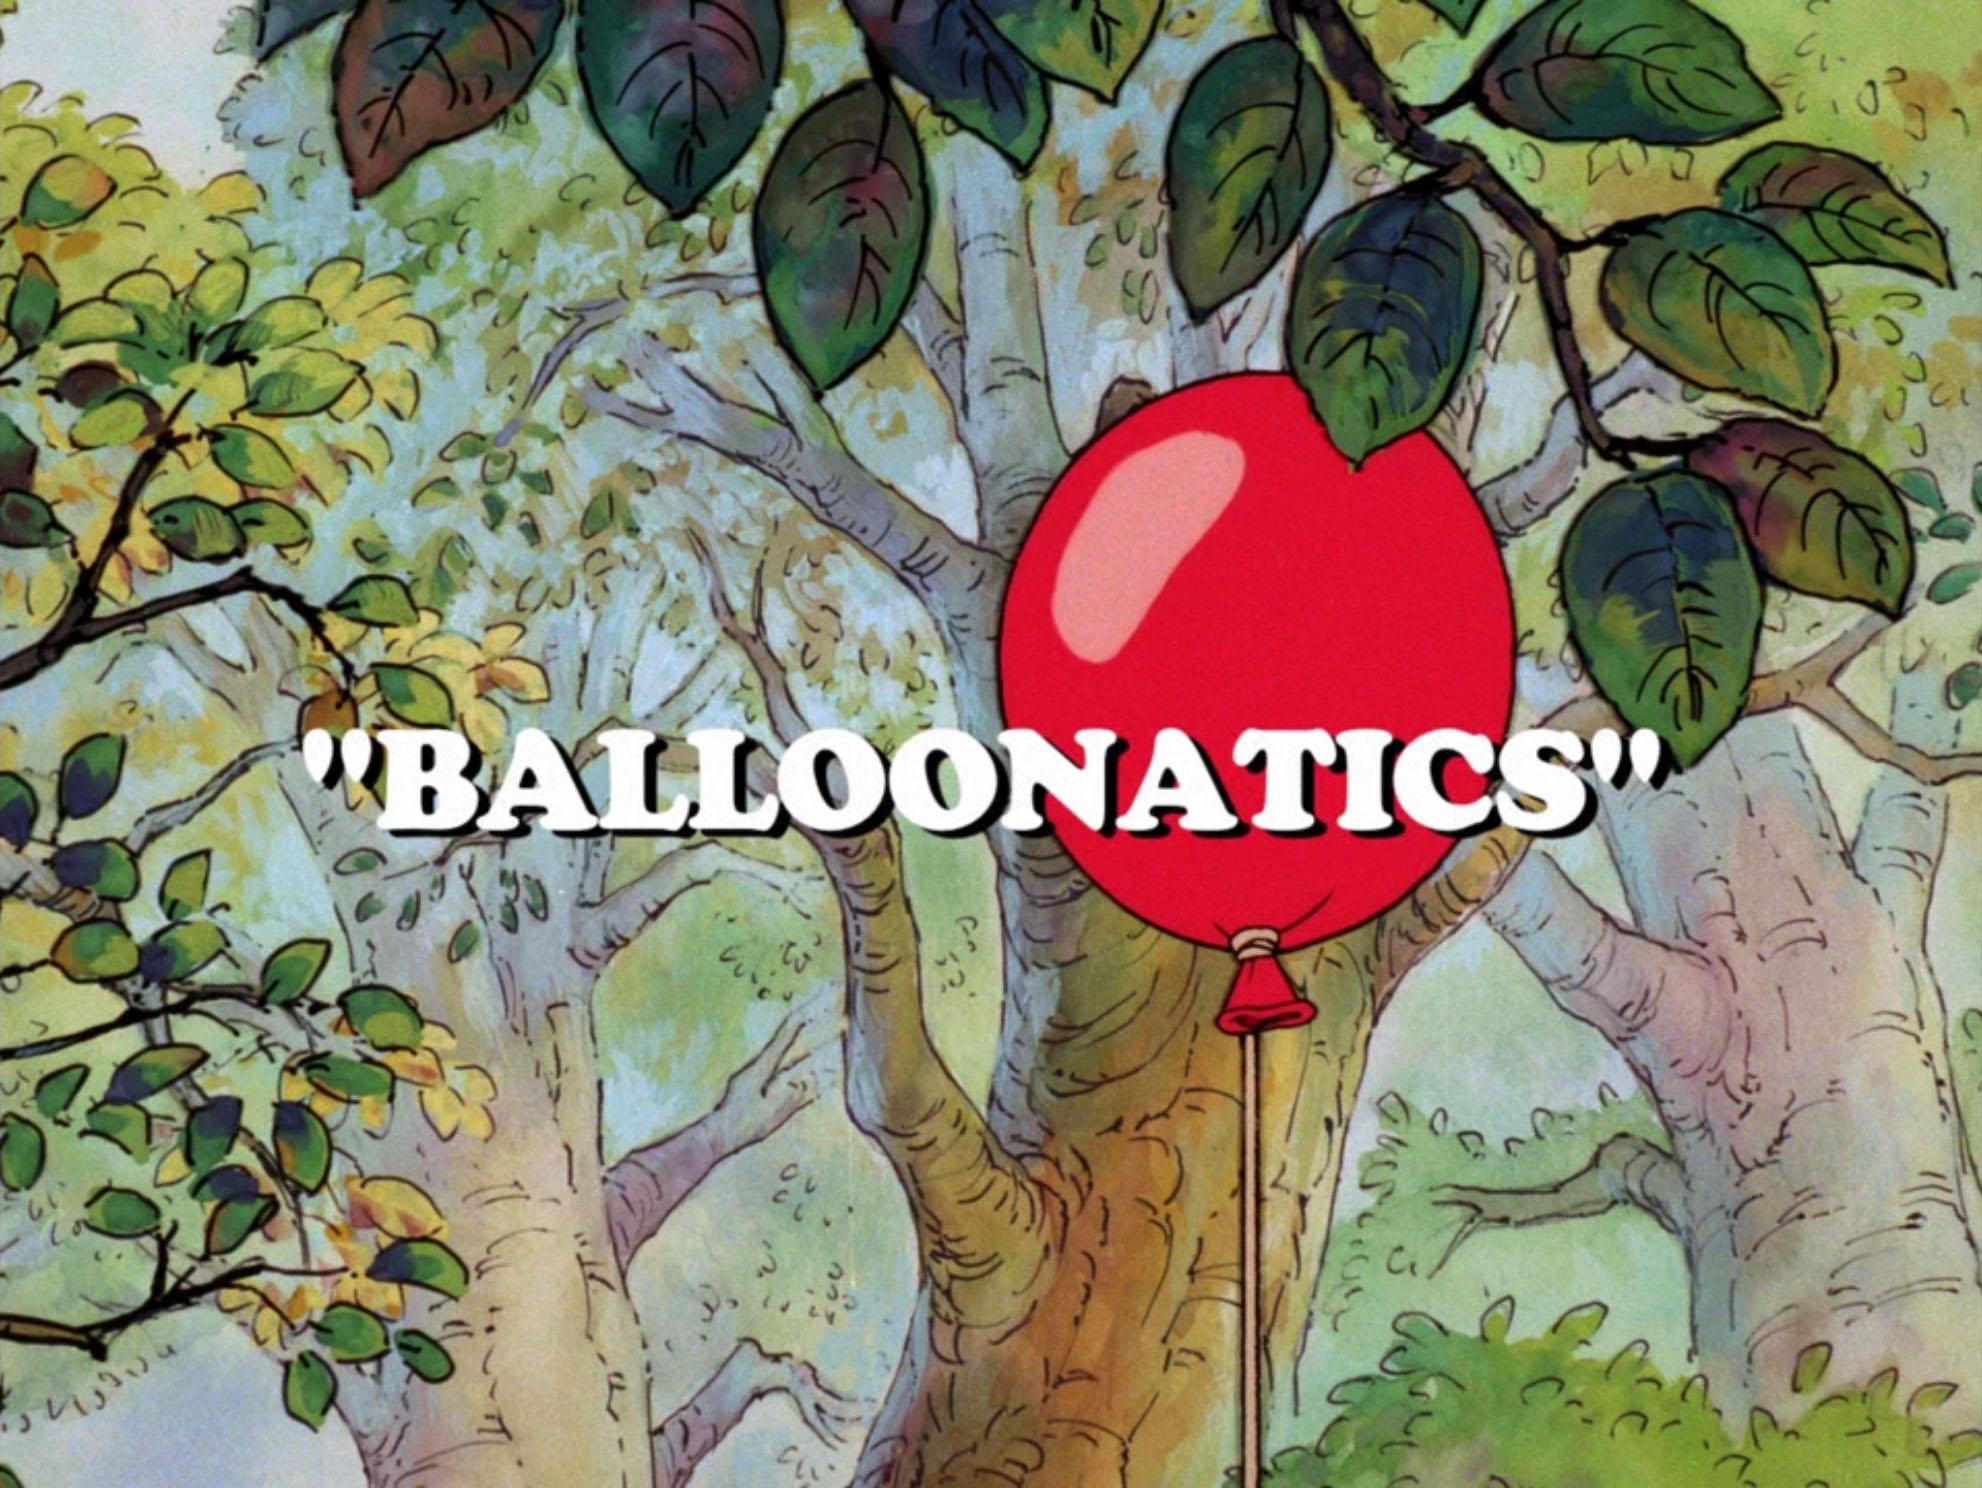 File:Balloonaticscool.jpg